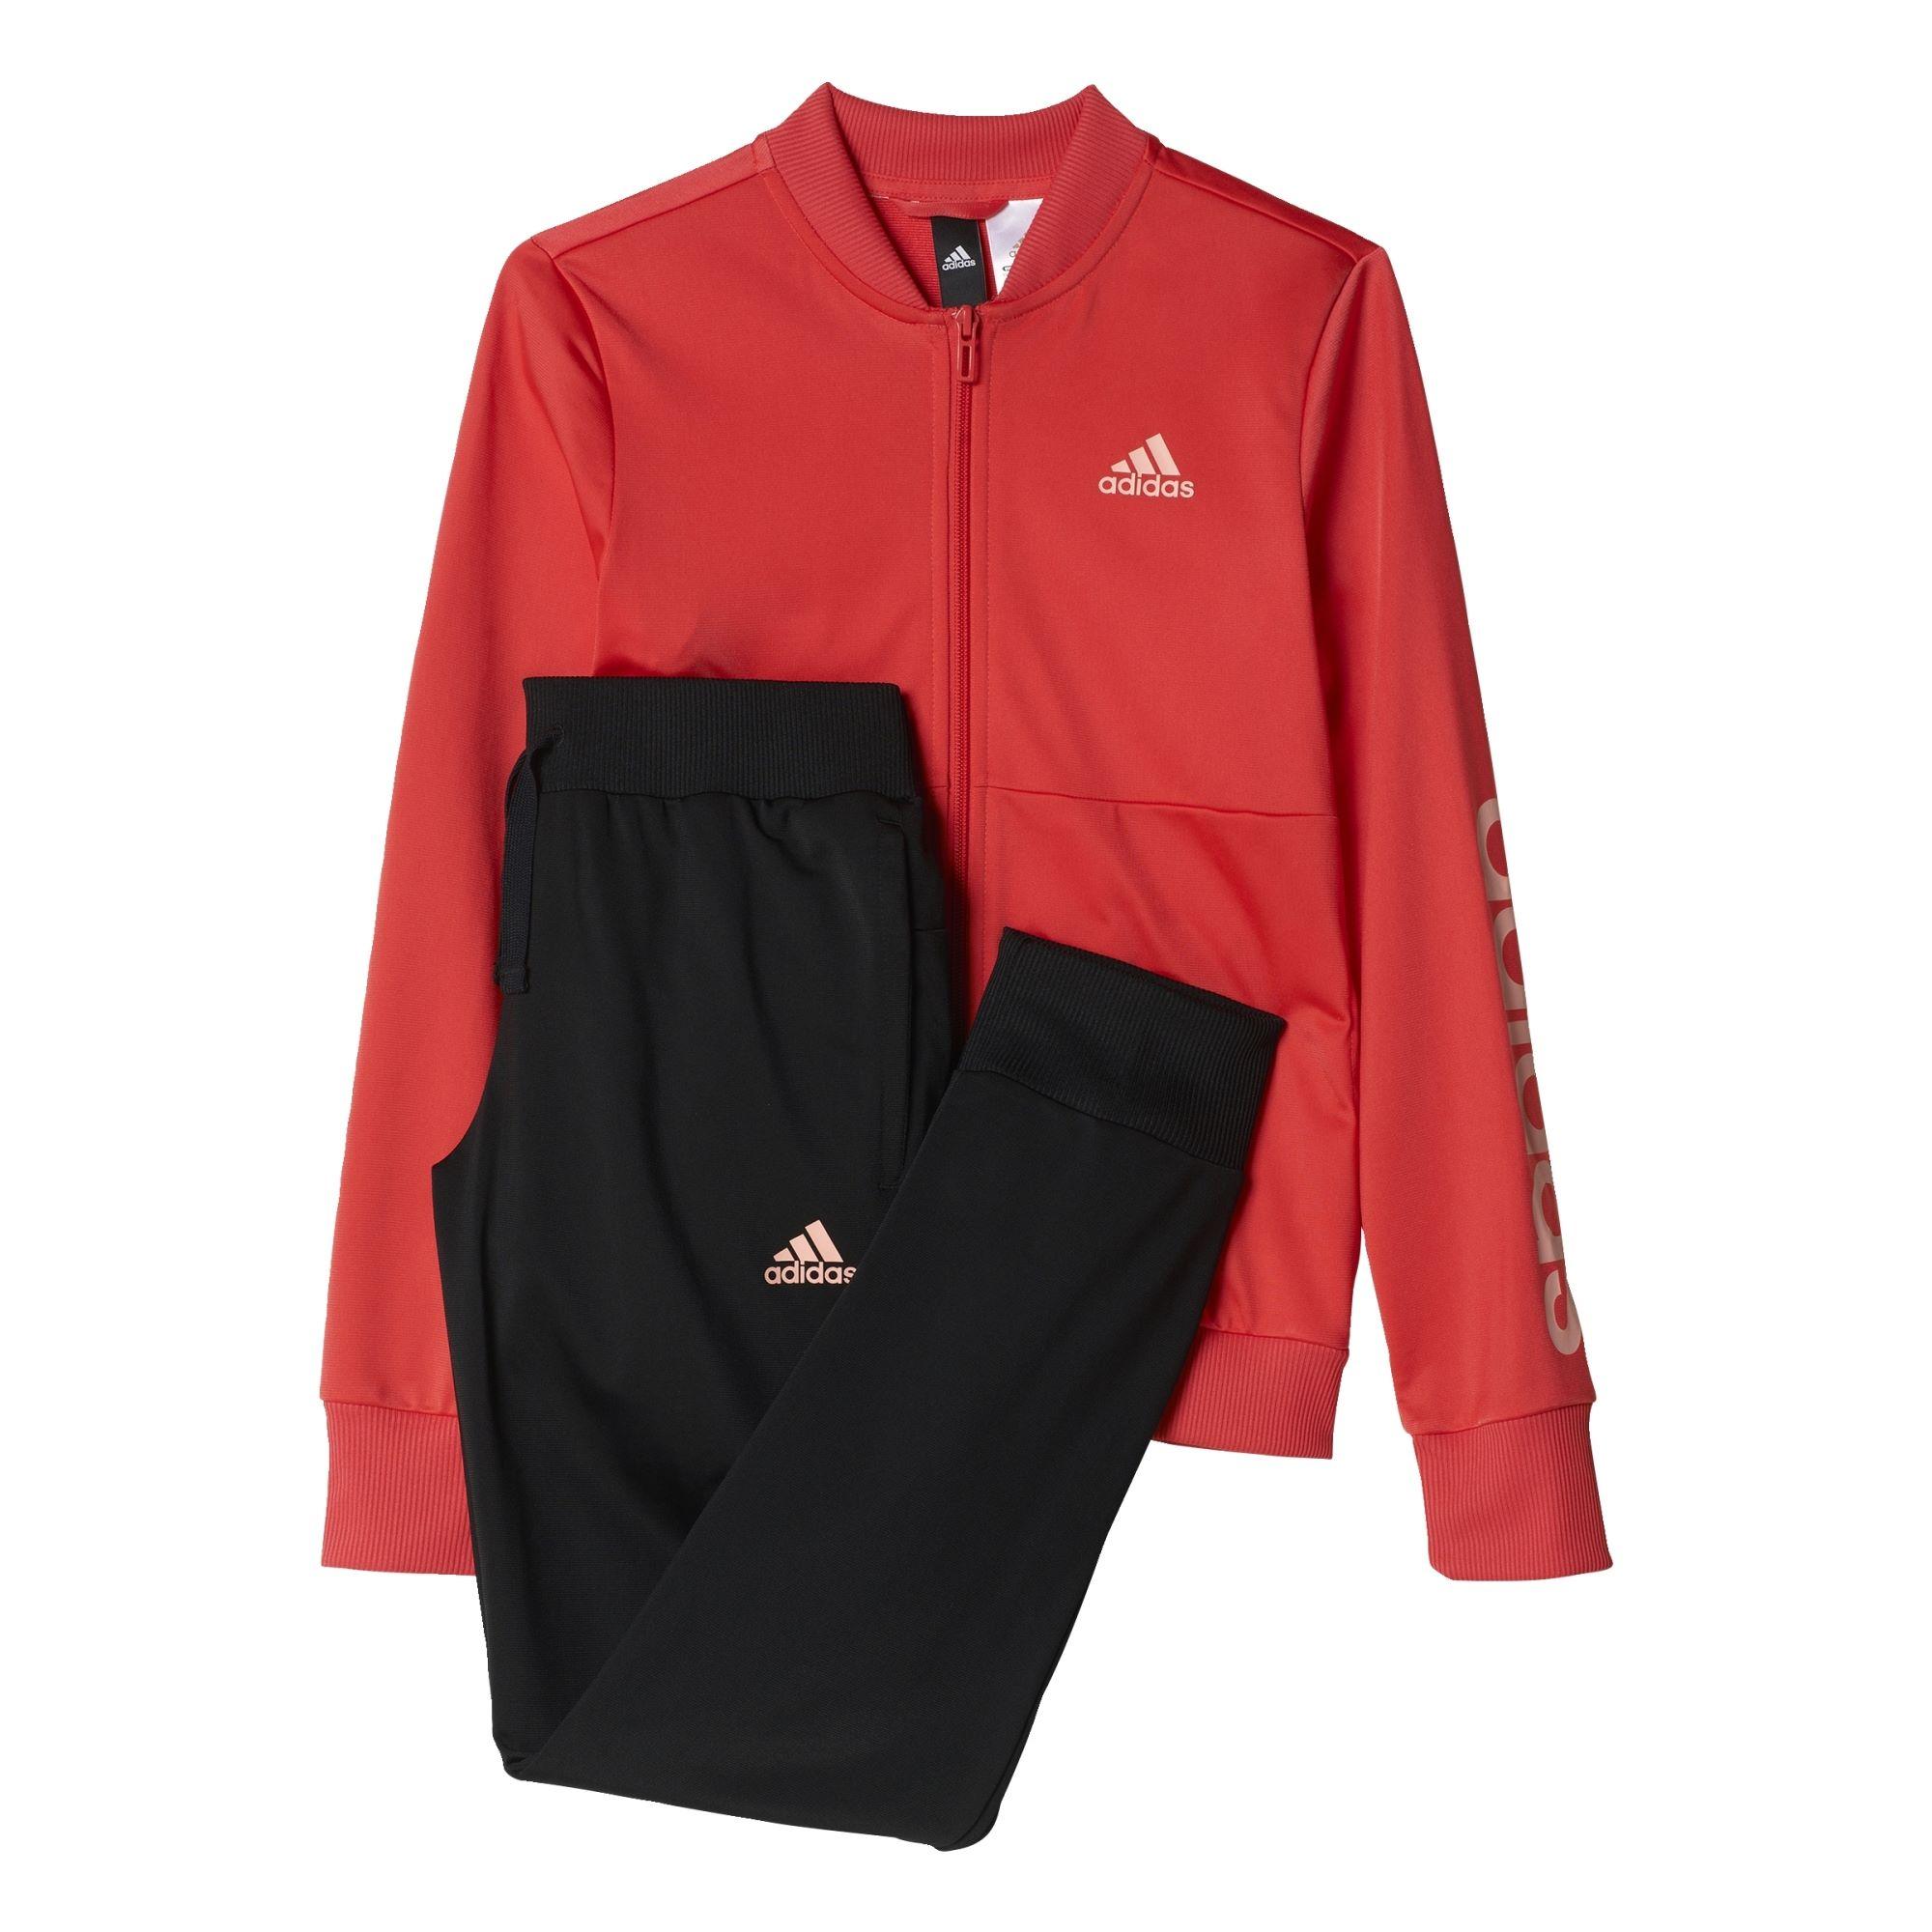 Adidas Pes TS Meisjes trainingspak